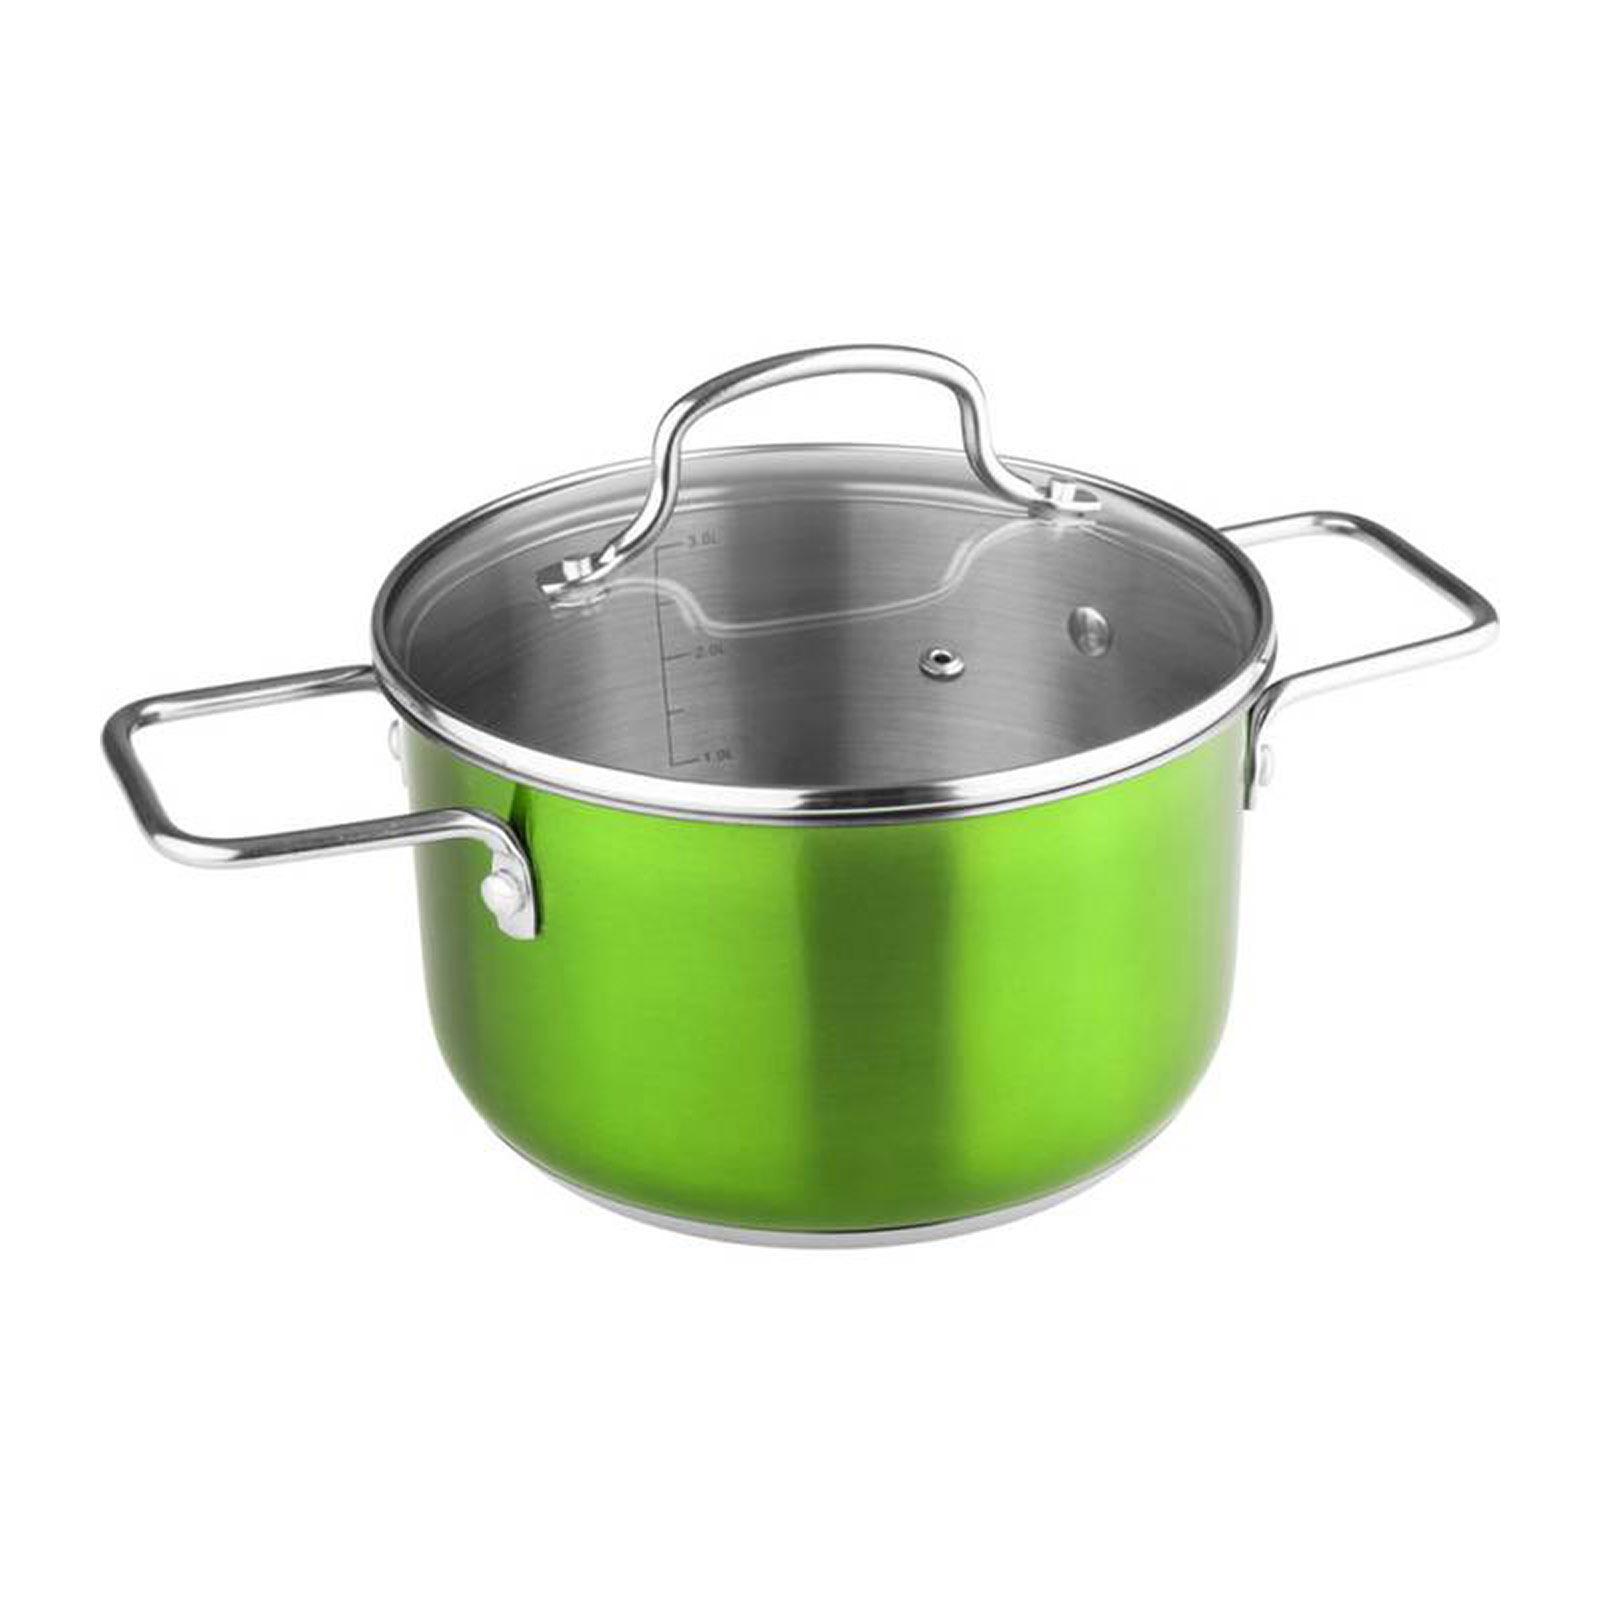 Lamart Joli Pot 20CM Green